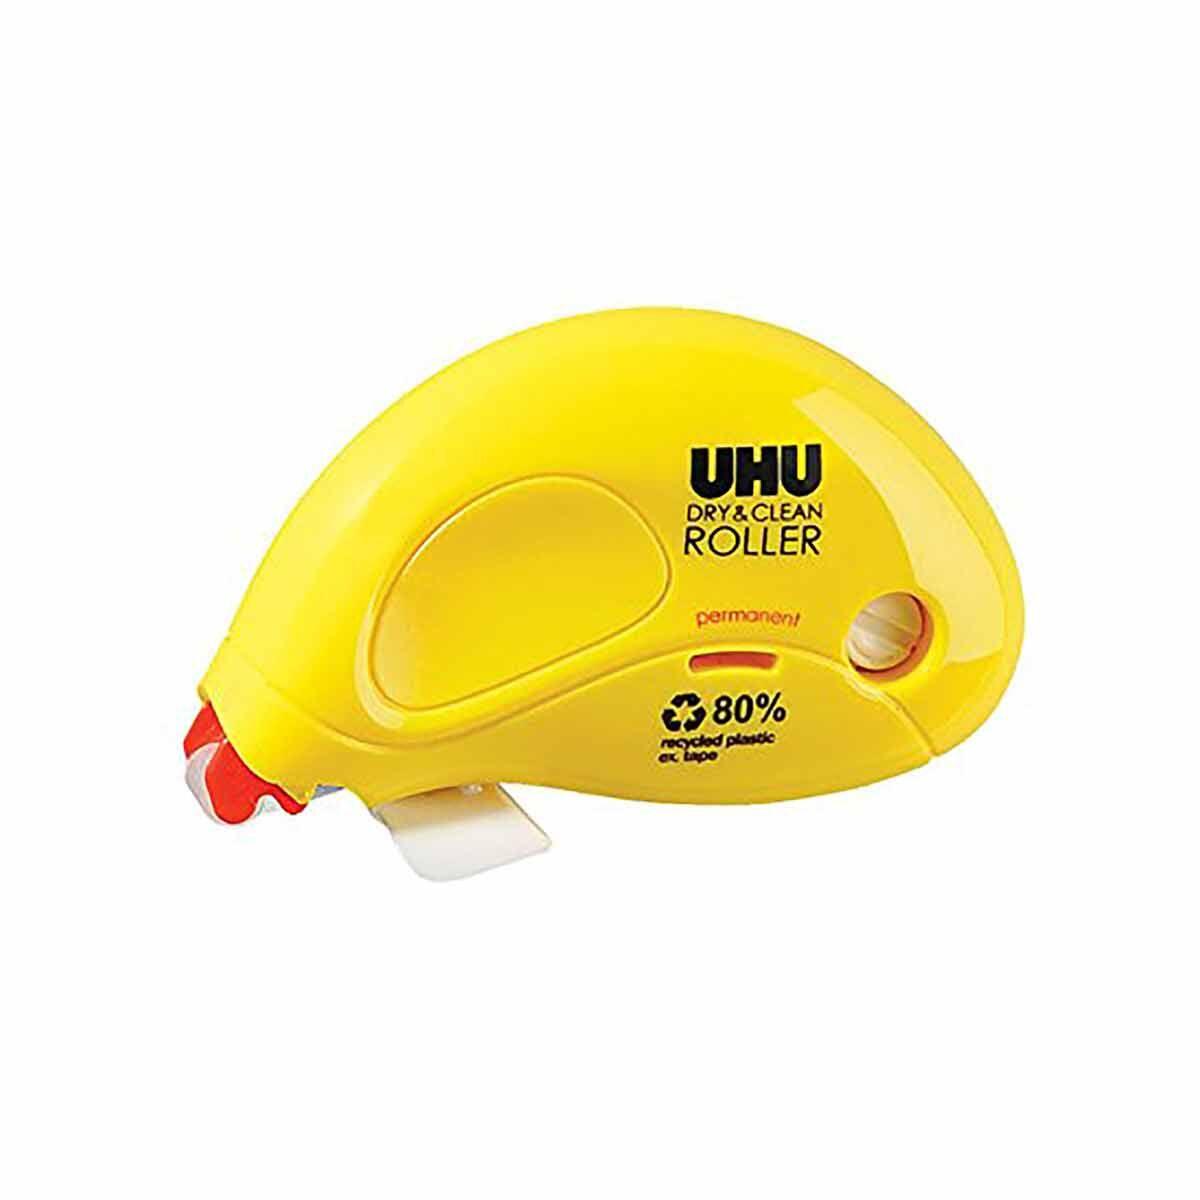 UHU Permanent Roller Glue